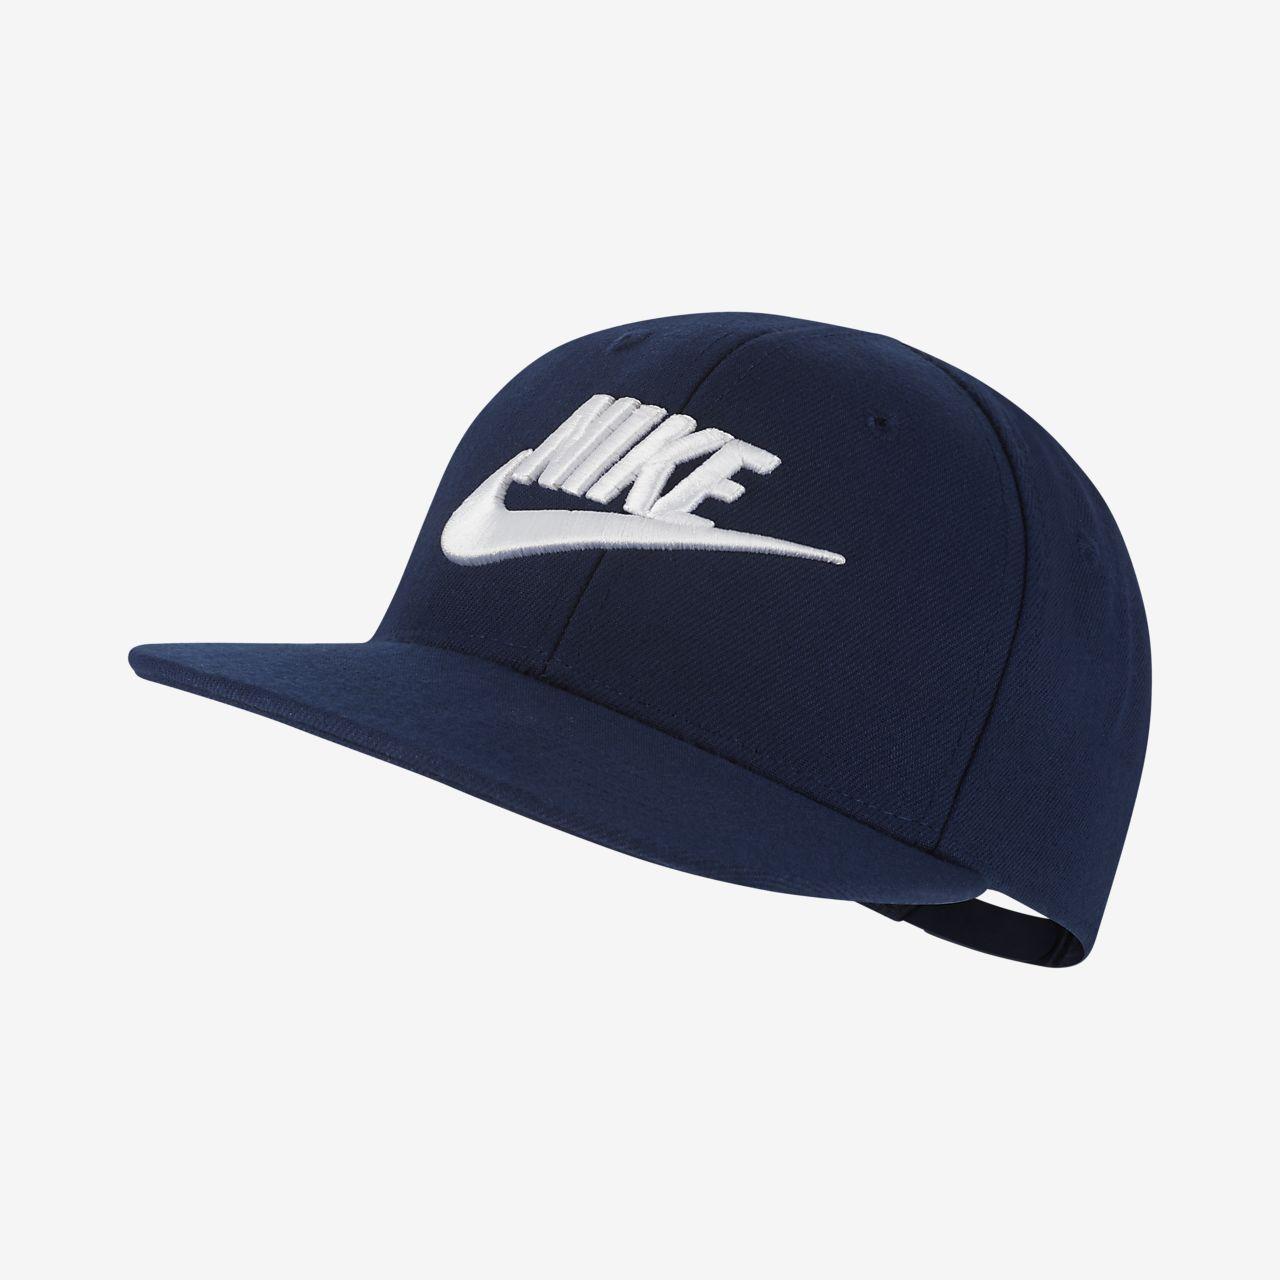 2b944cc967d Nike Younger Kids  Adjustable Hat. Nike.com GB